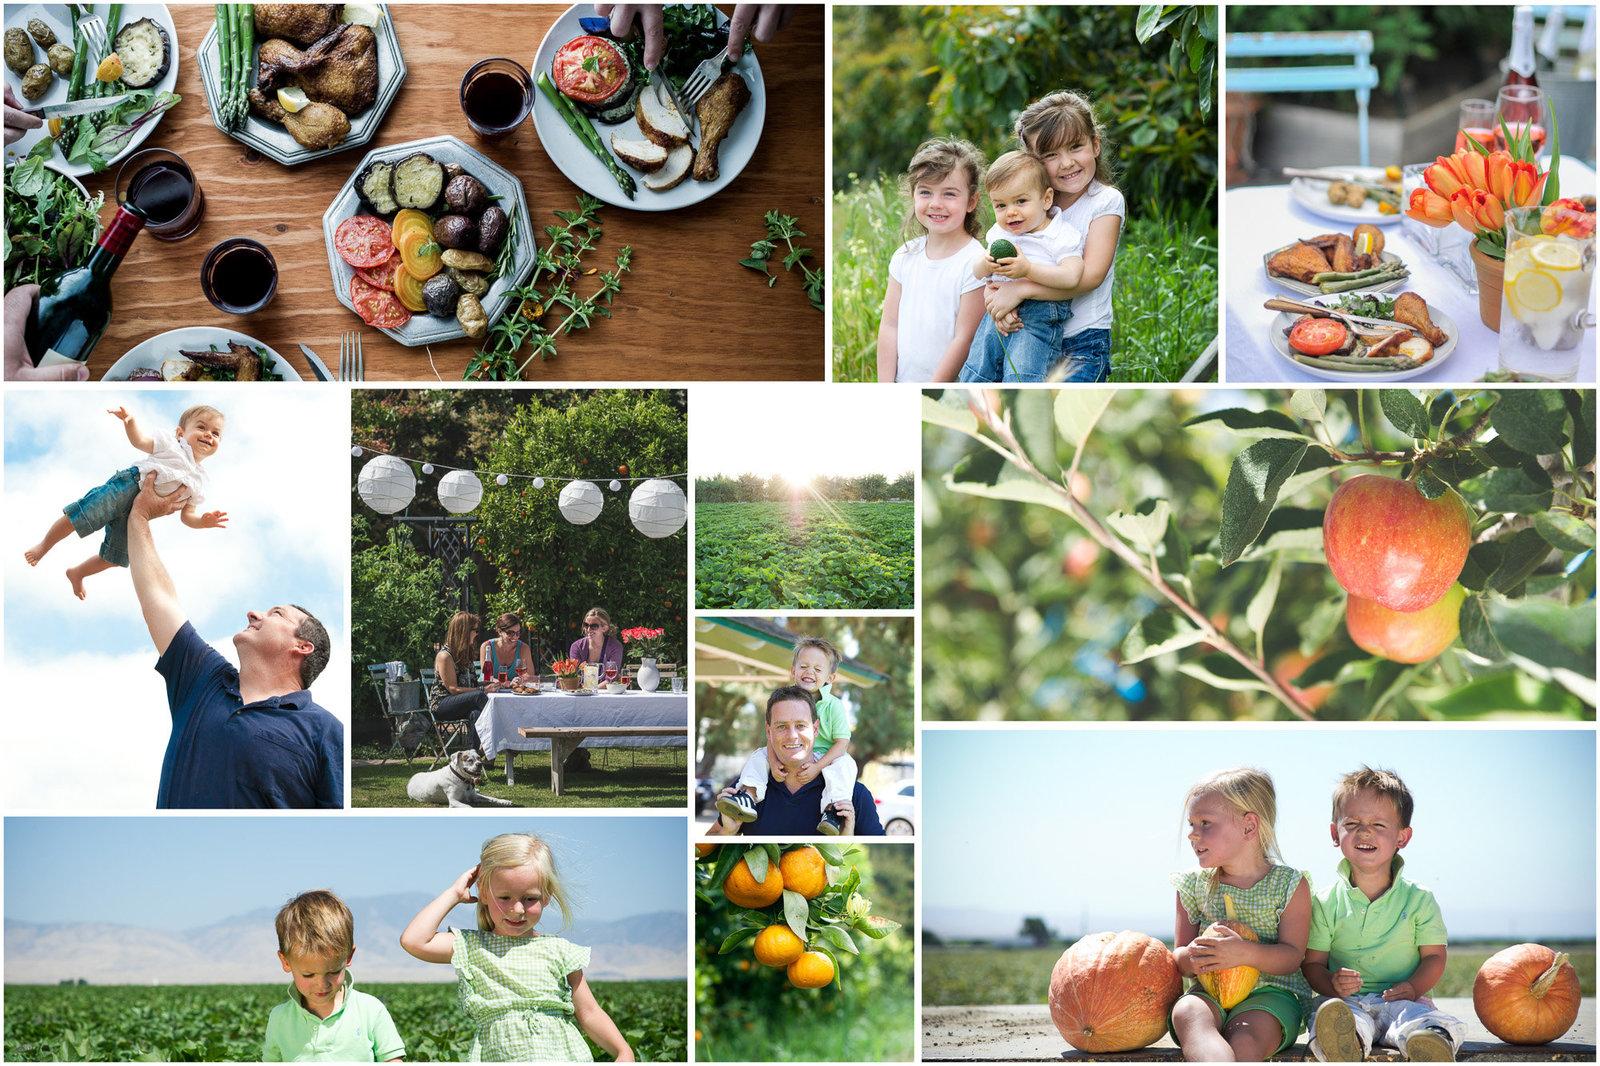 1_Whole Foods kids collage -2016-Portfolio